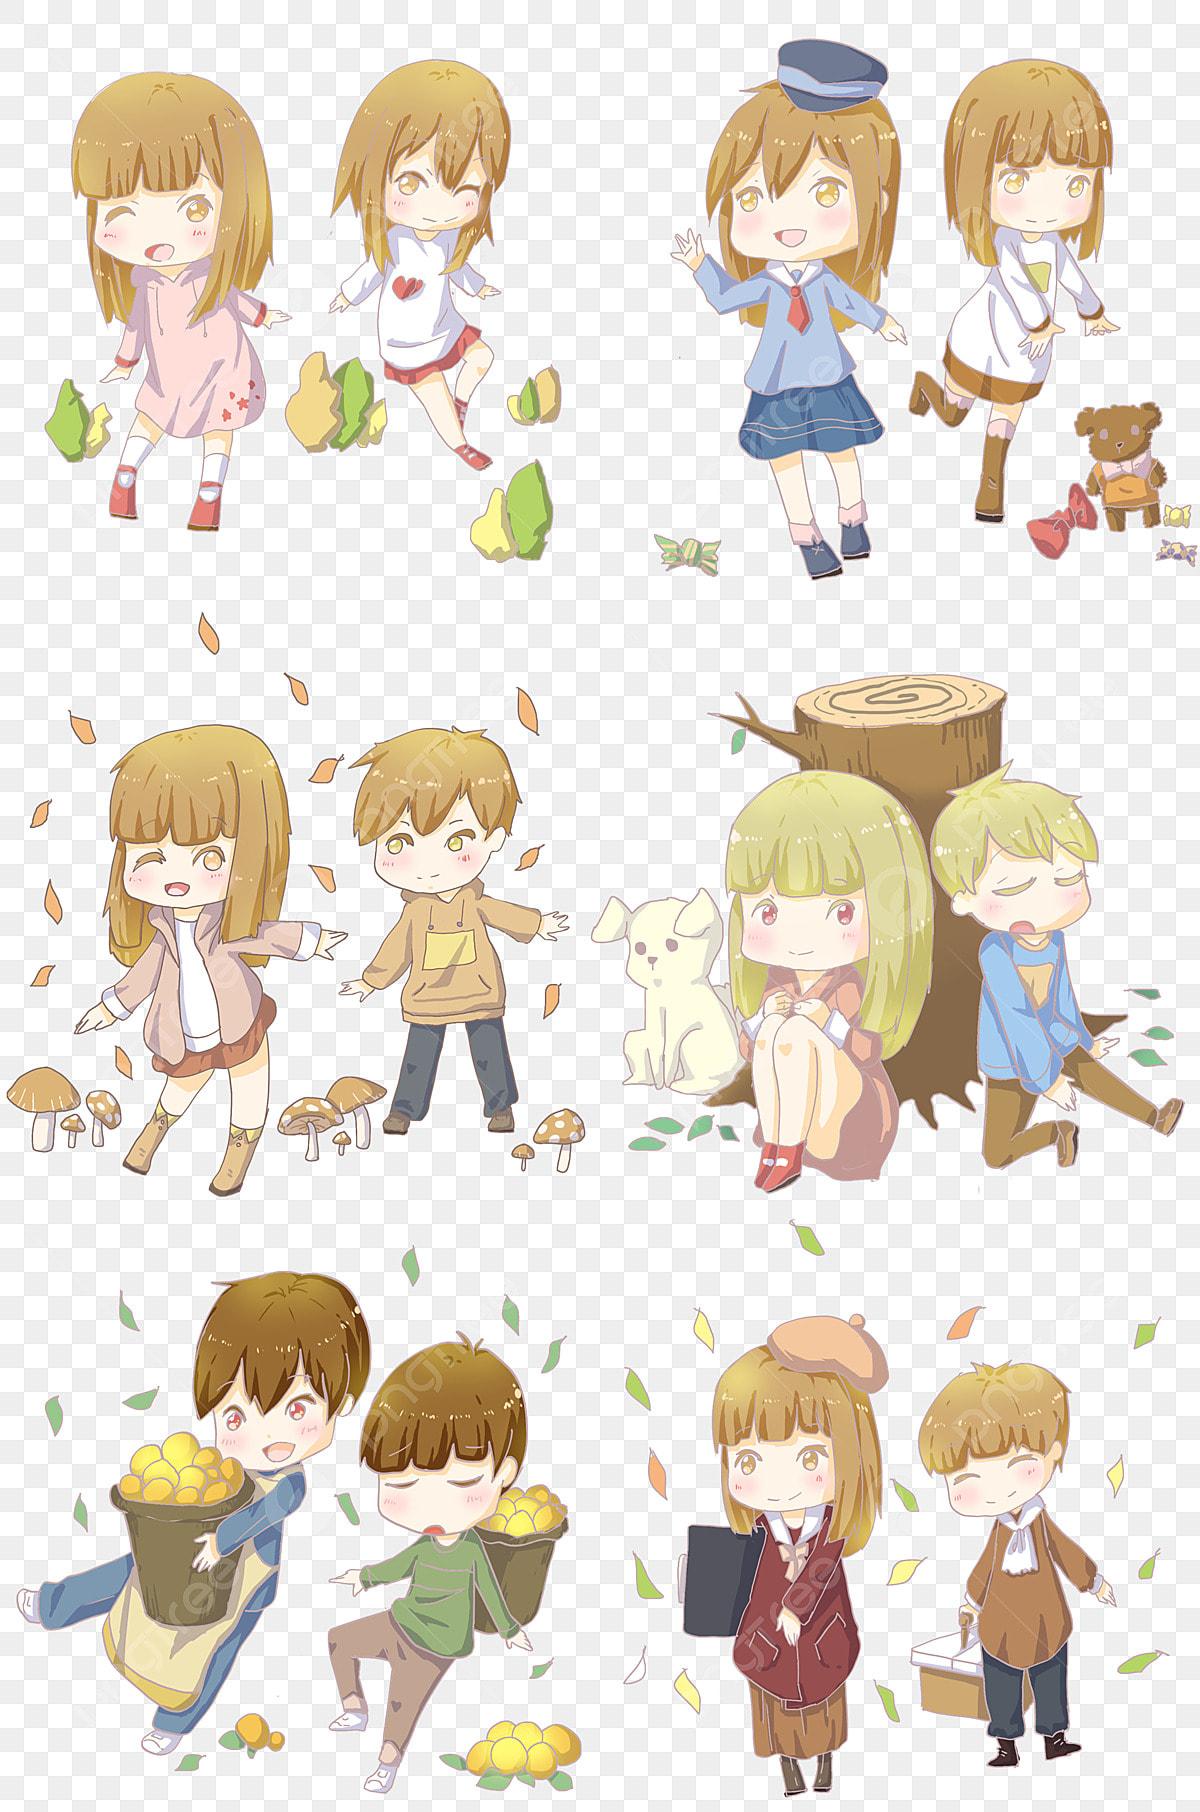 Autumn Boys And Girls Cute Cartoon Cartoon Characters Boy Girl